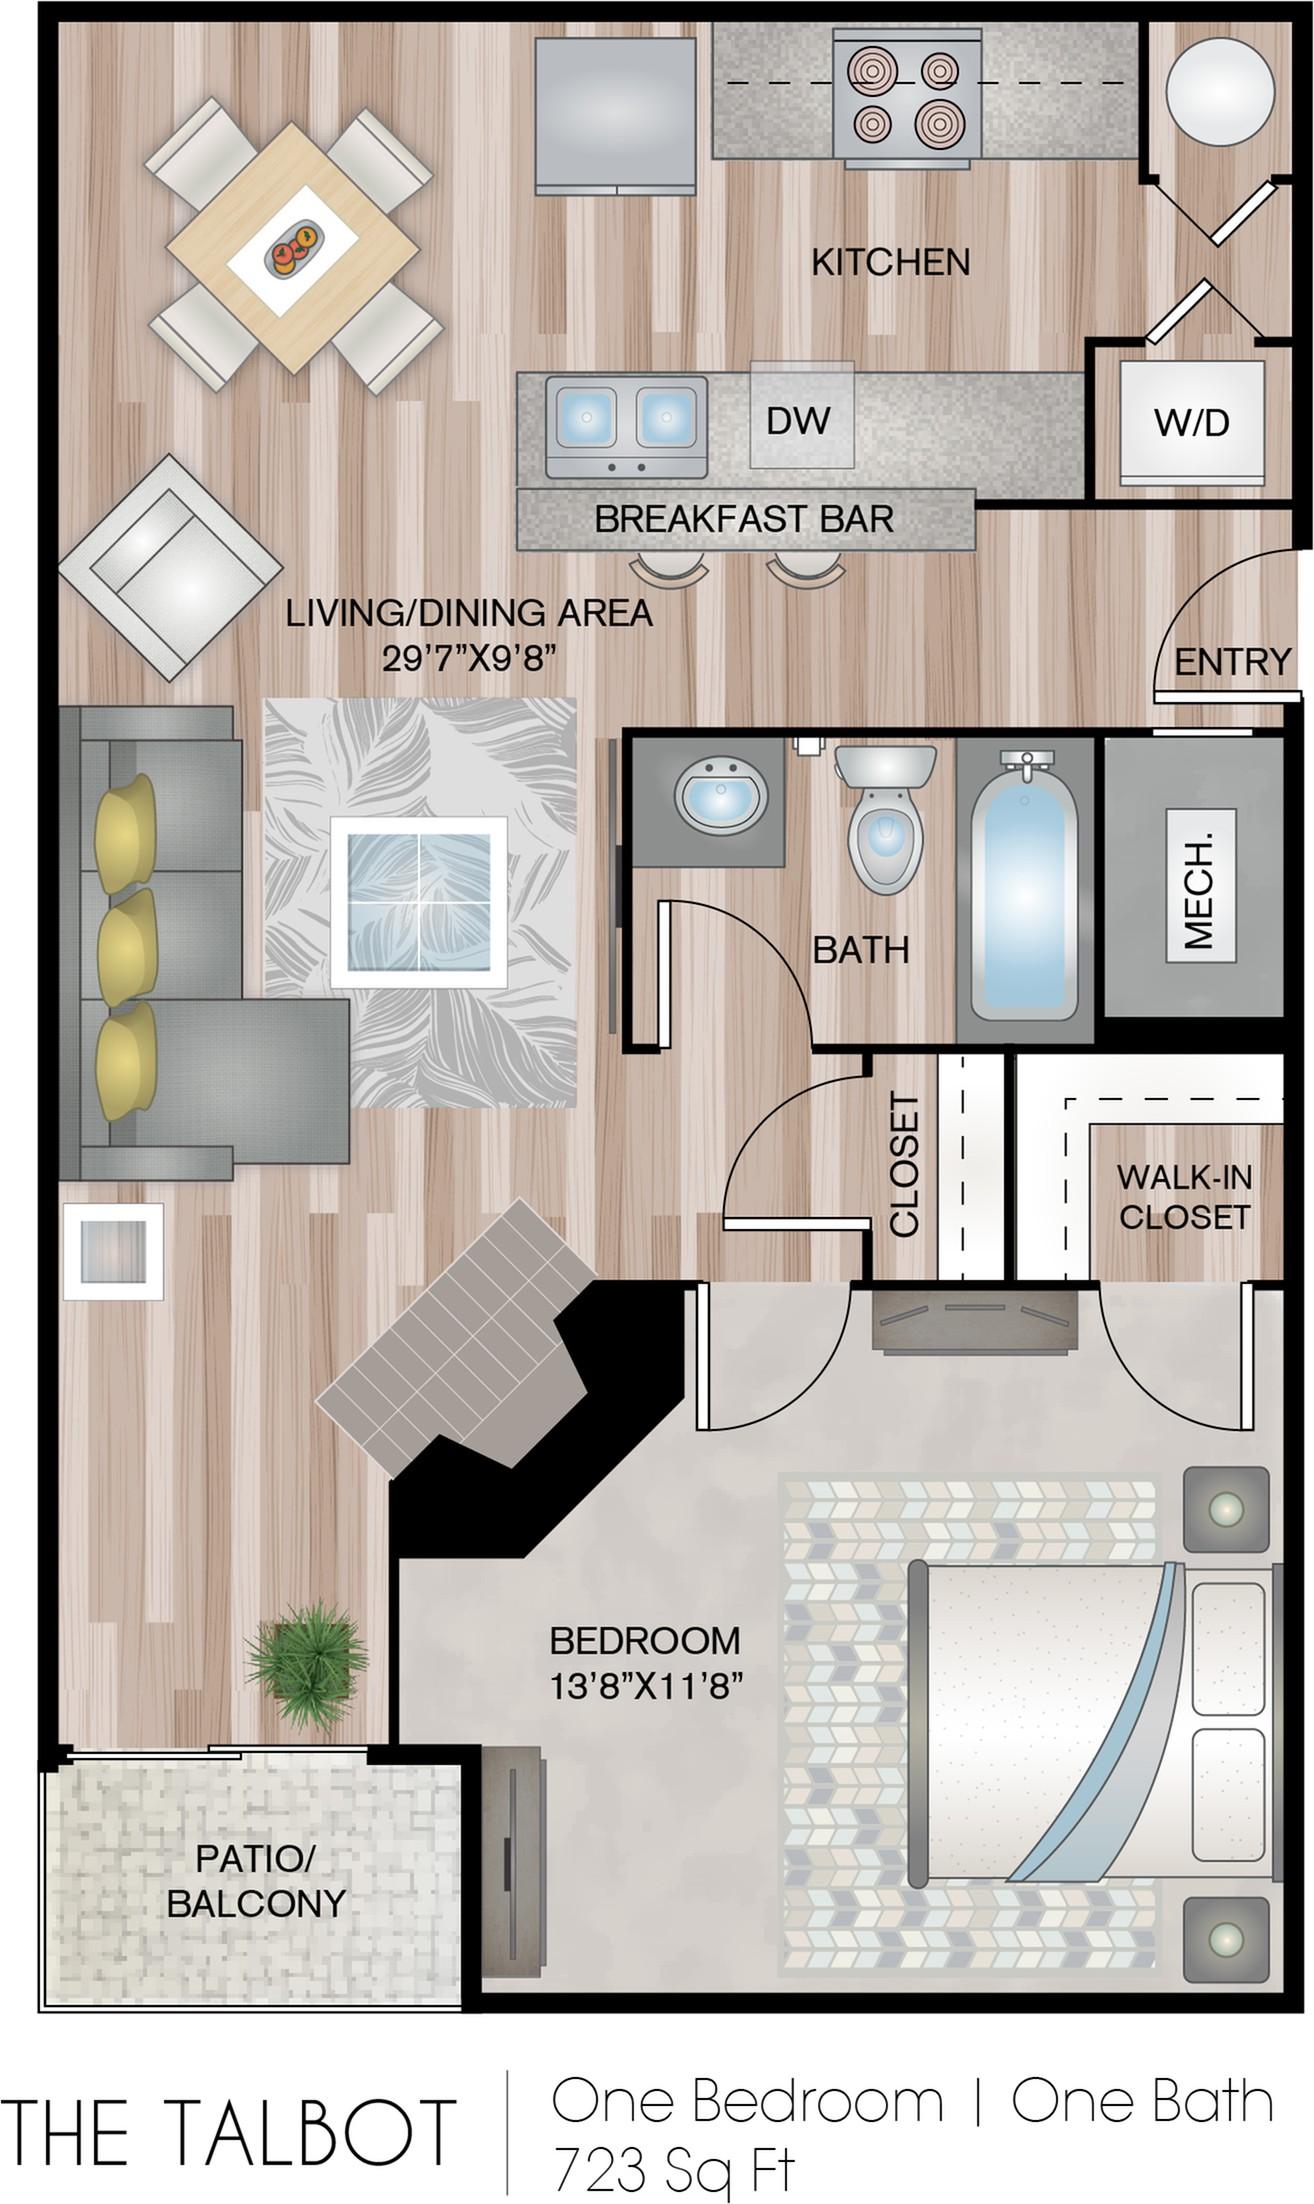 Residences at Falcon North